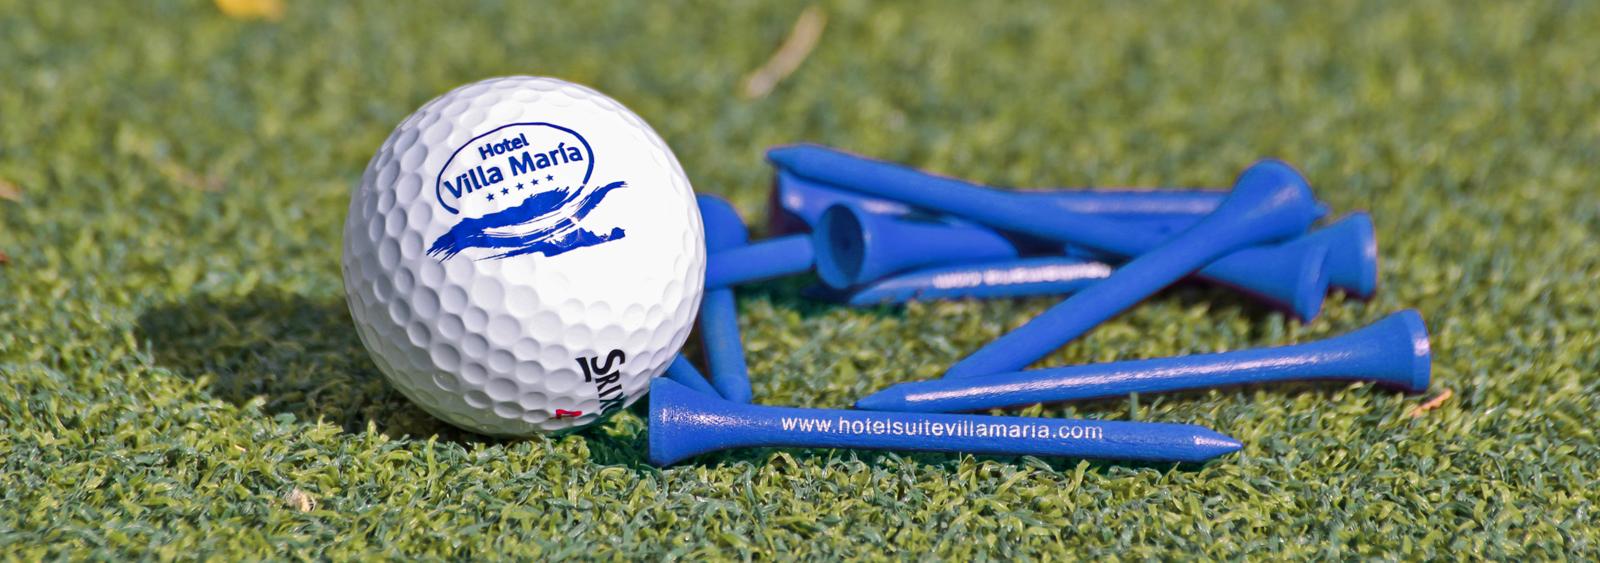 pelota mini golf2 HS Villa MariaNavy